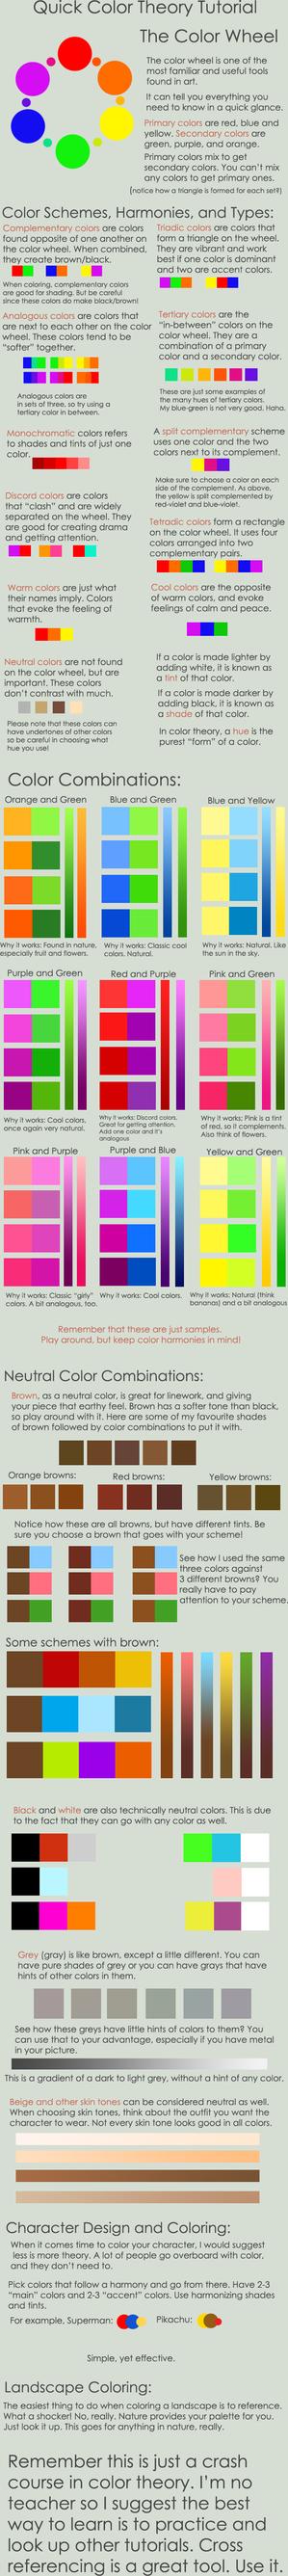 Color Theory Crash Course by pronouncedyou